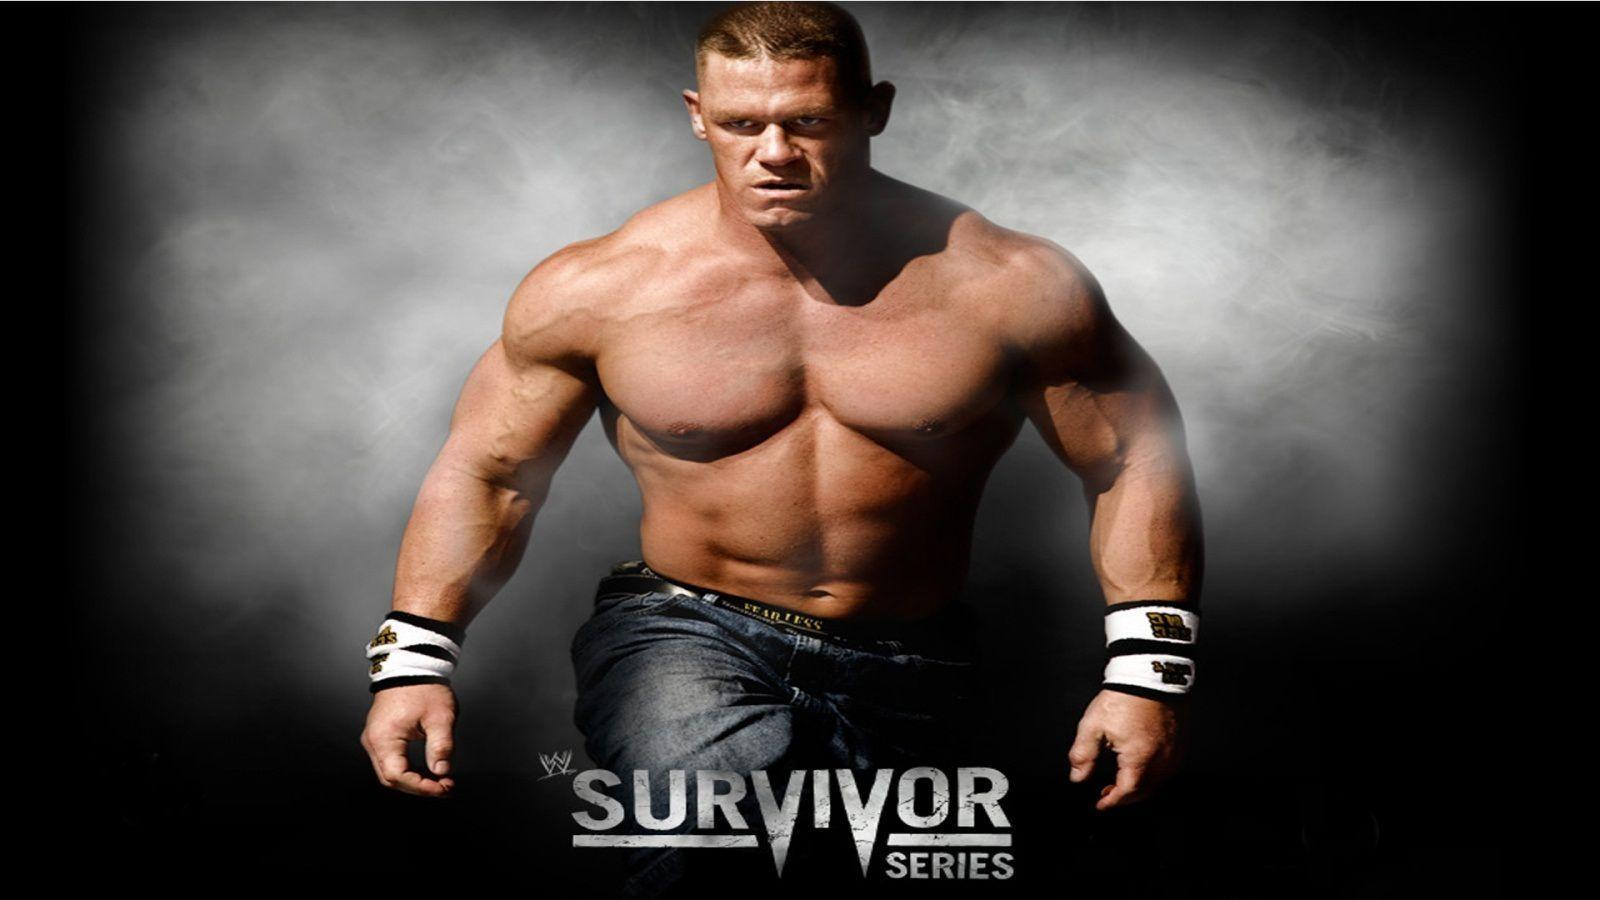 John Cena Body Wallpapers 2015 - Wallpaper Cave